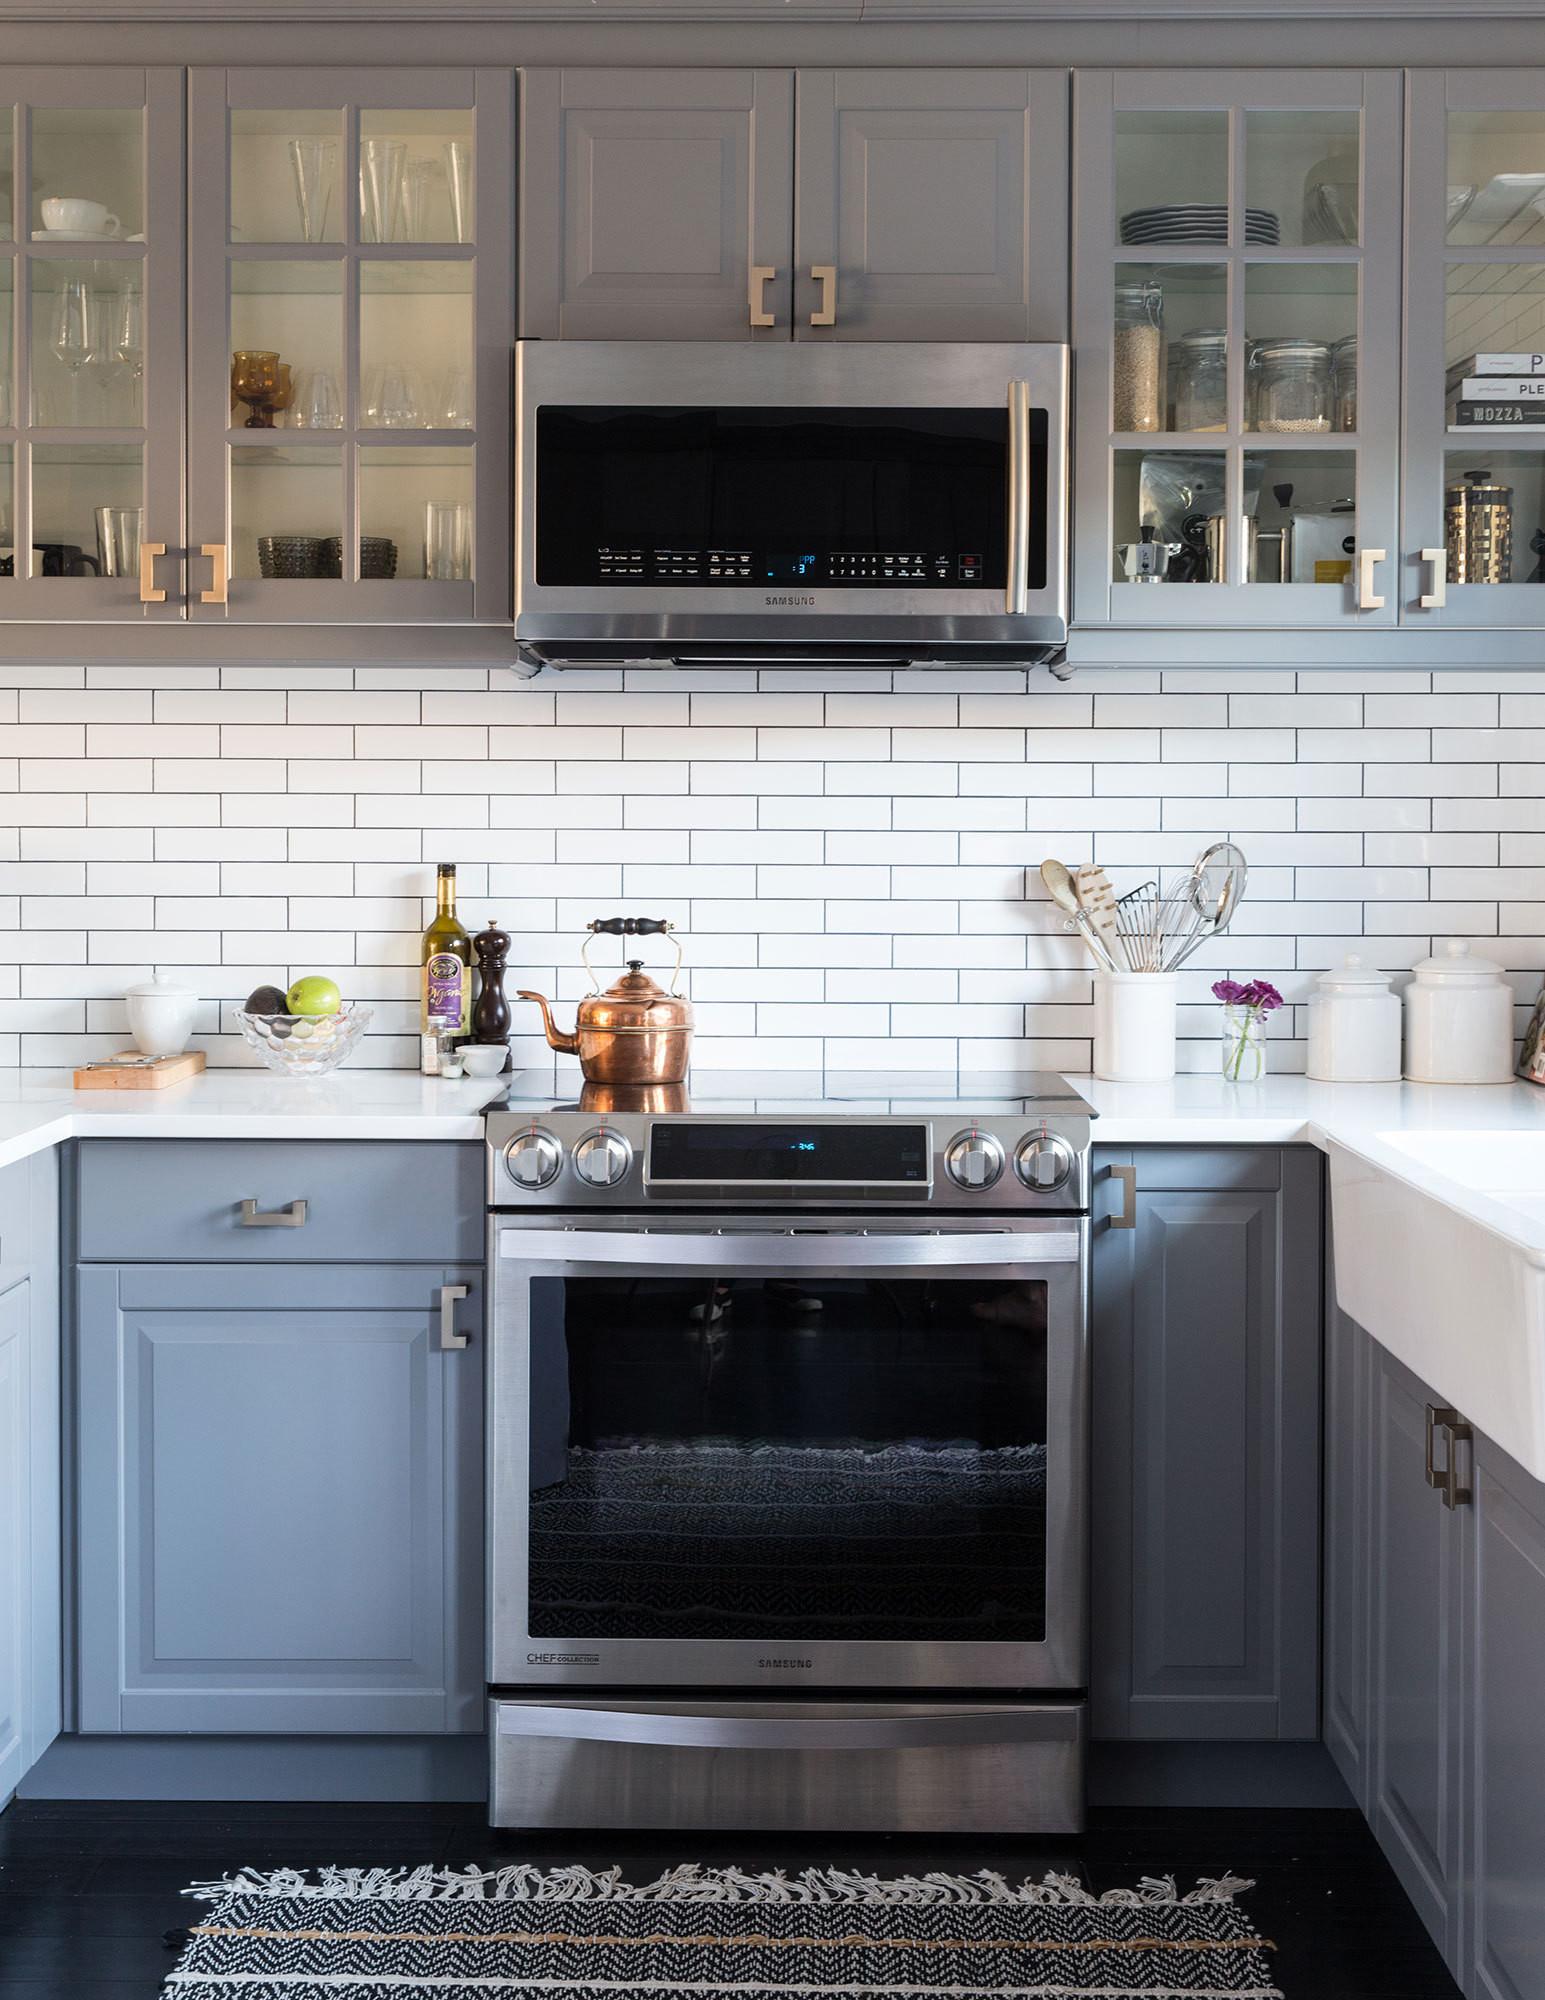 CAITLIN MCCARTHY HANDCOCK PARK Kitchen 2.jpg